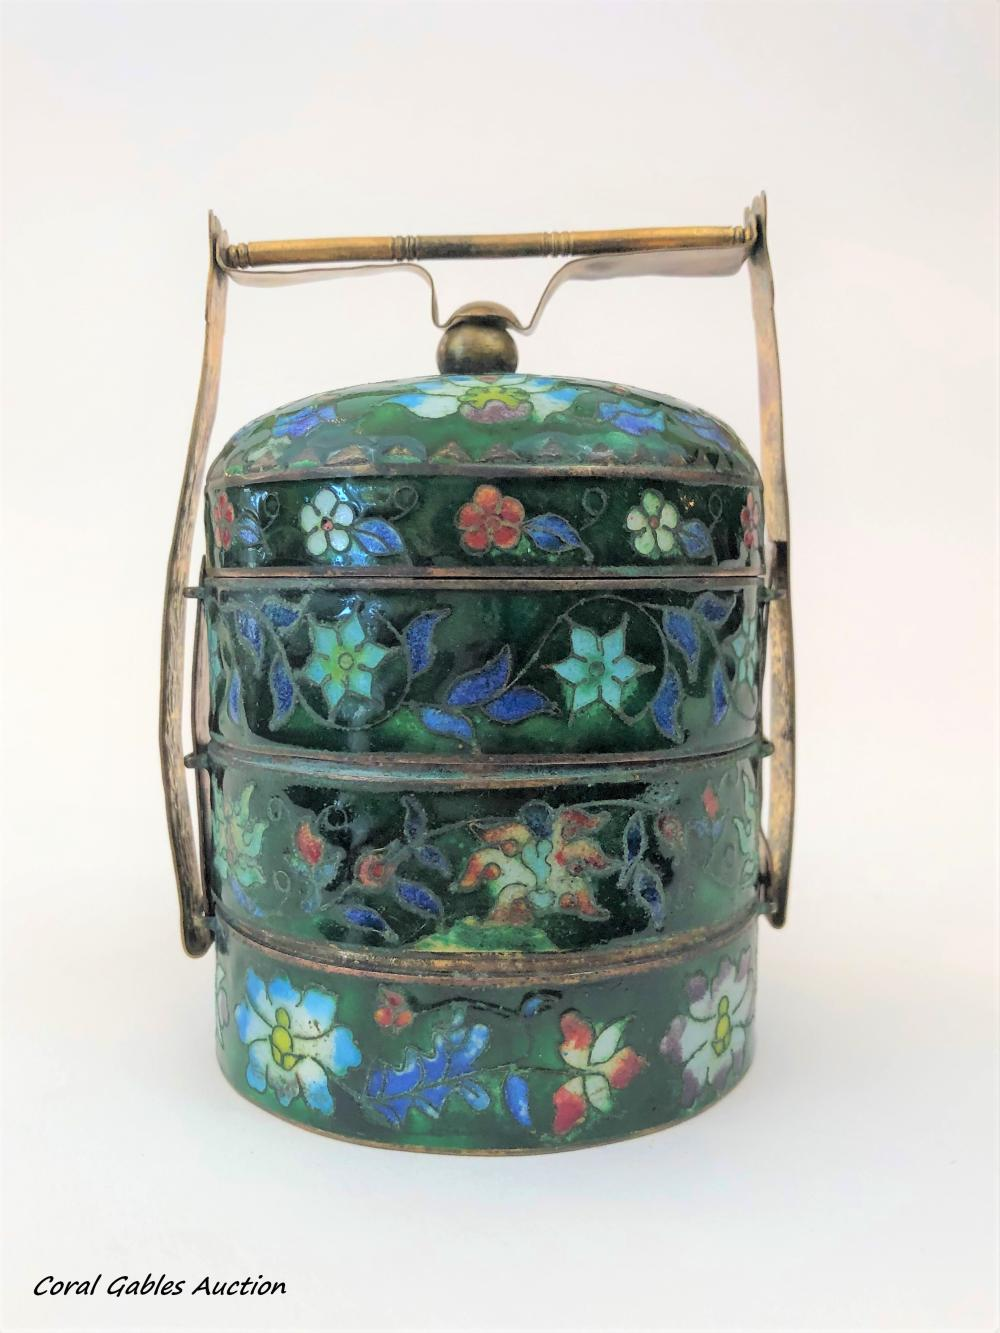 Cloisonne decorative piece